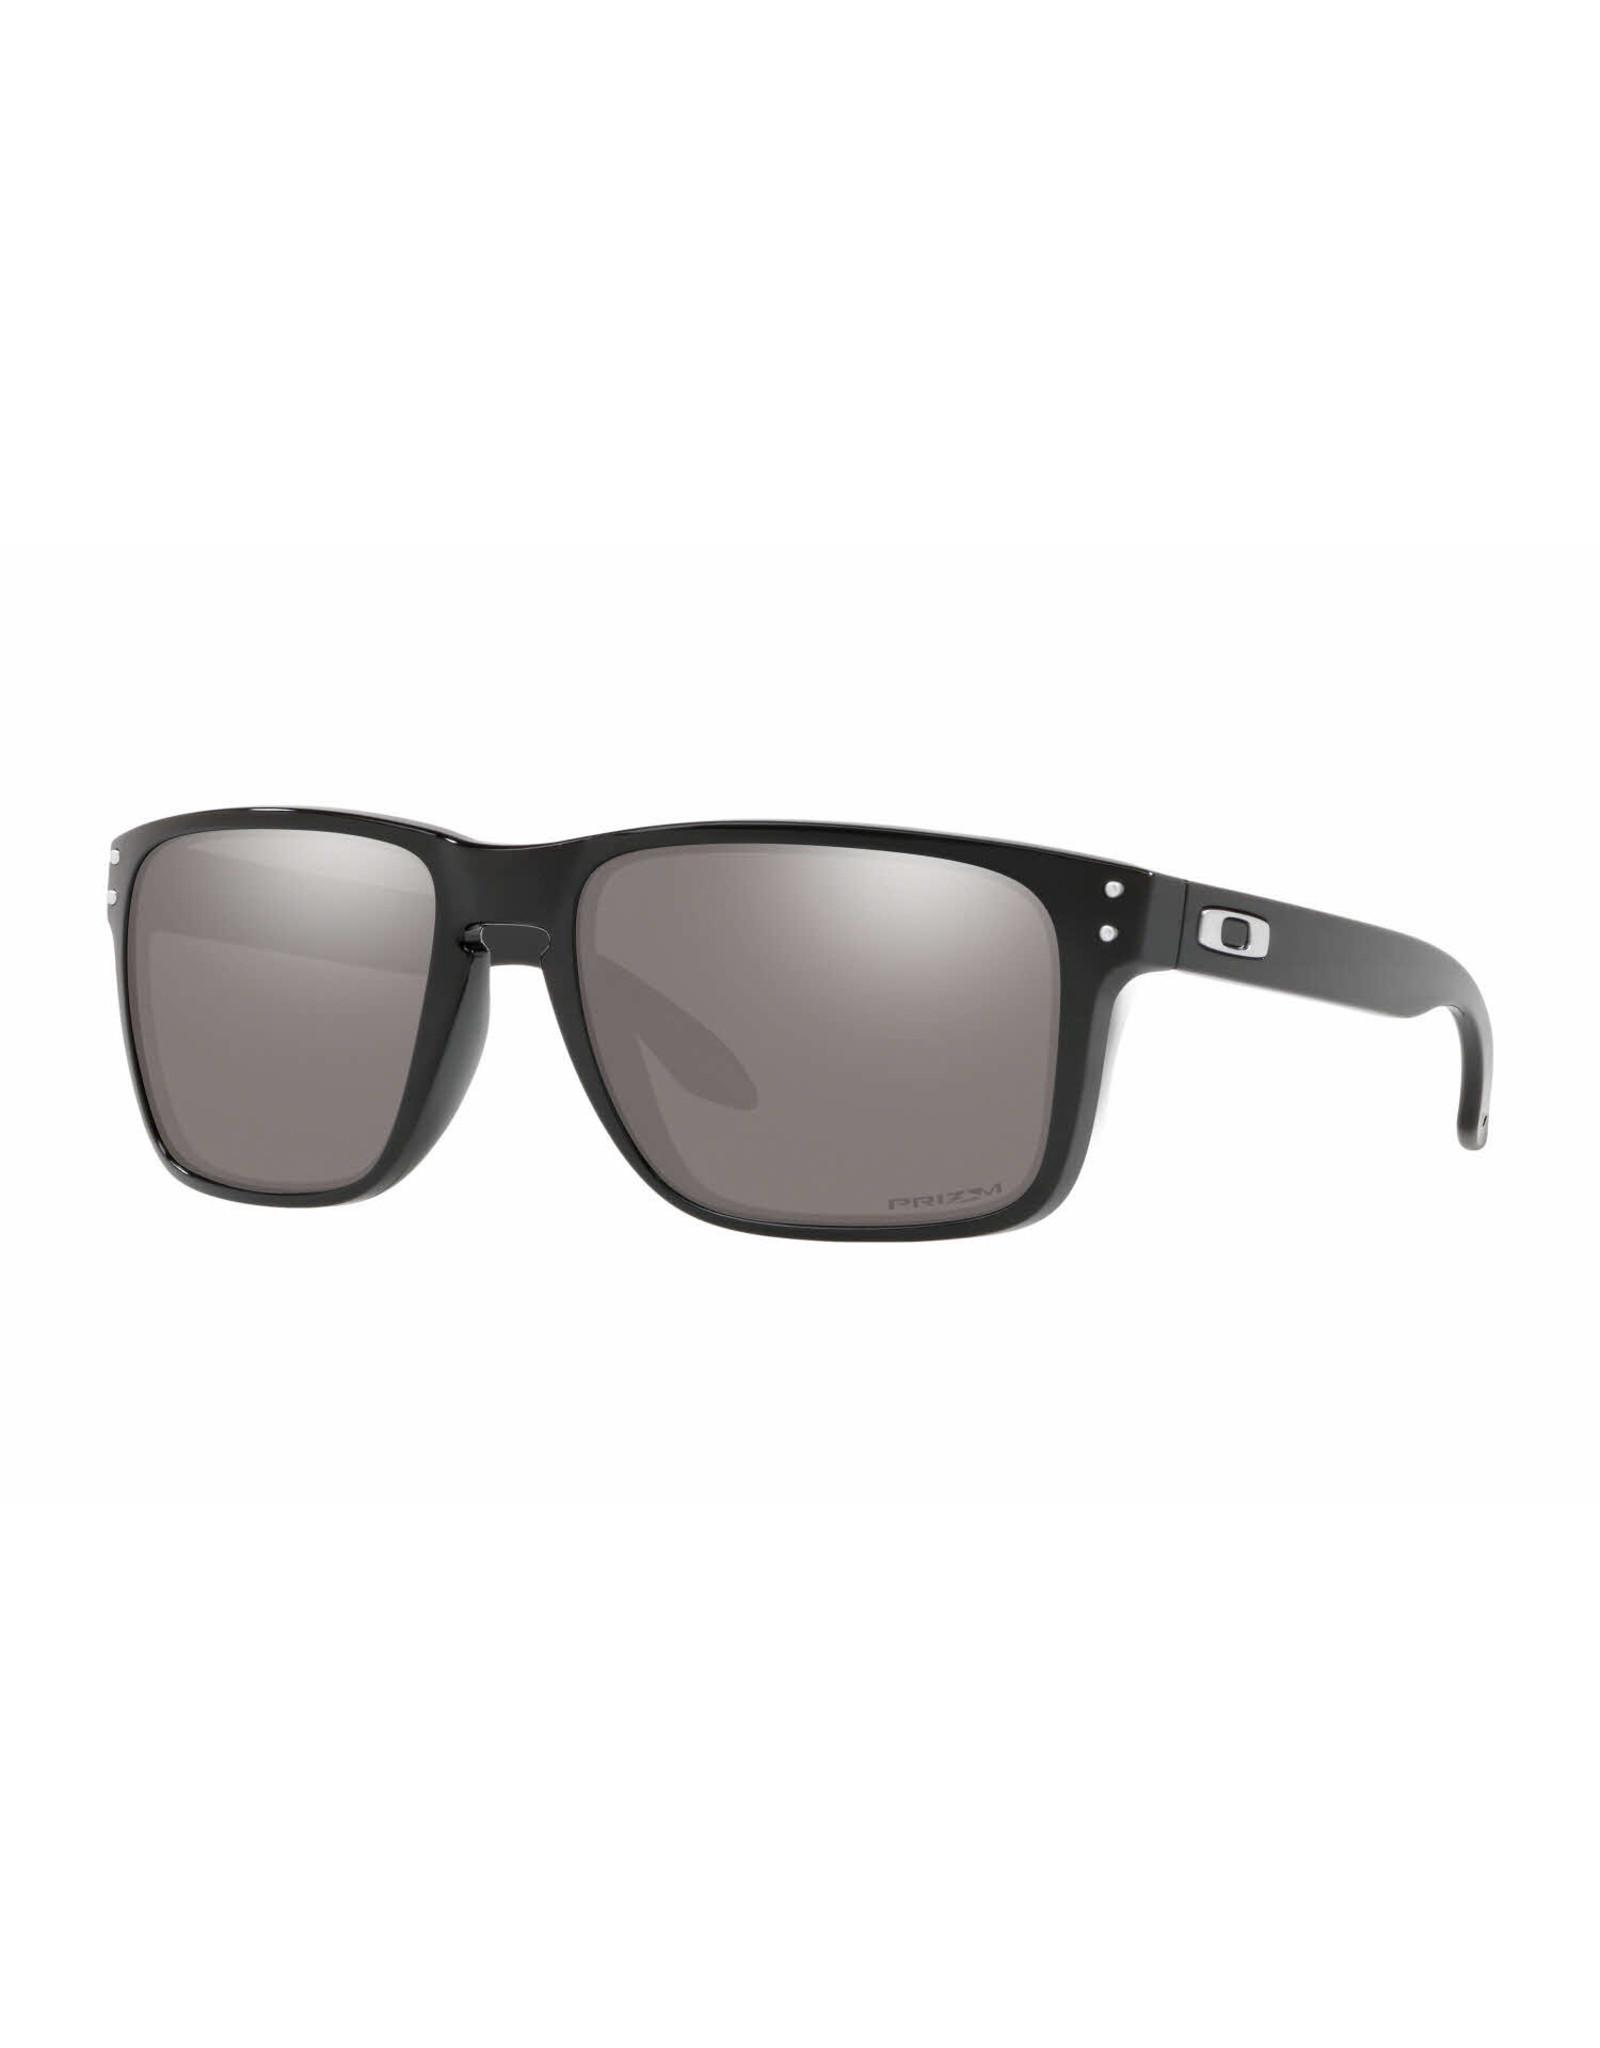 Oakley Mens sunglasses Holbrook XL polishes black w/ prizm black